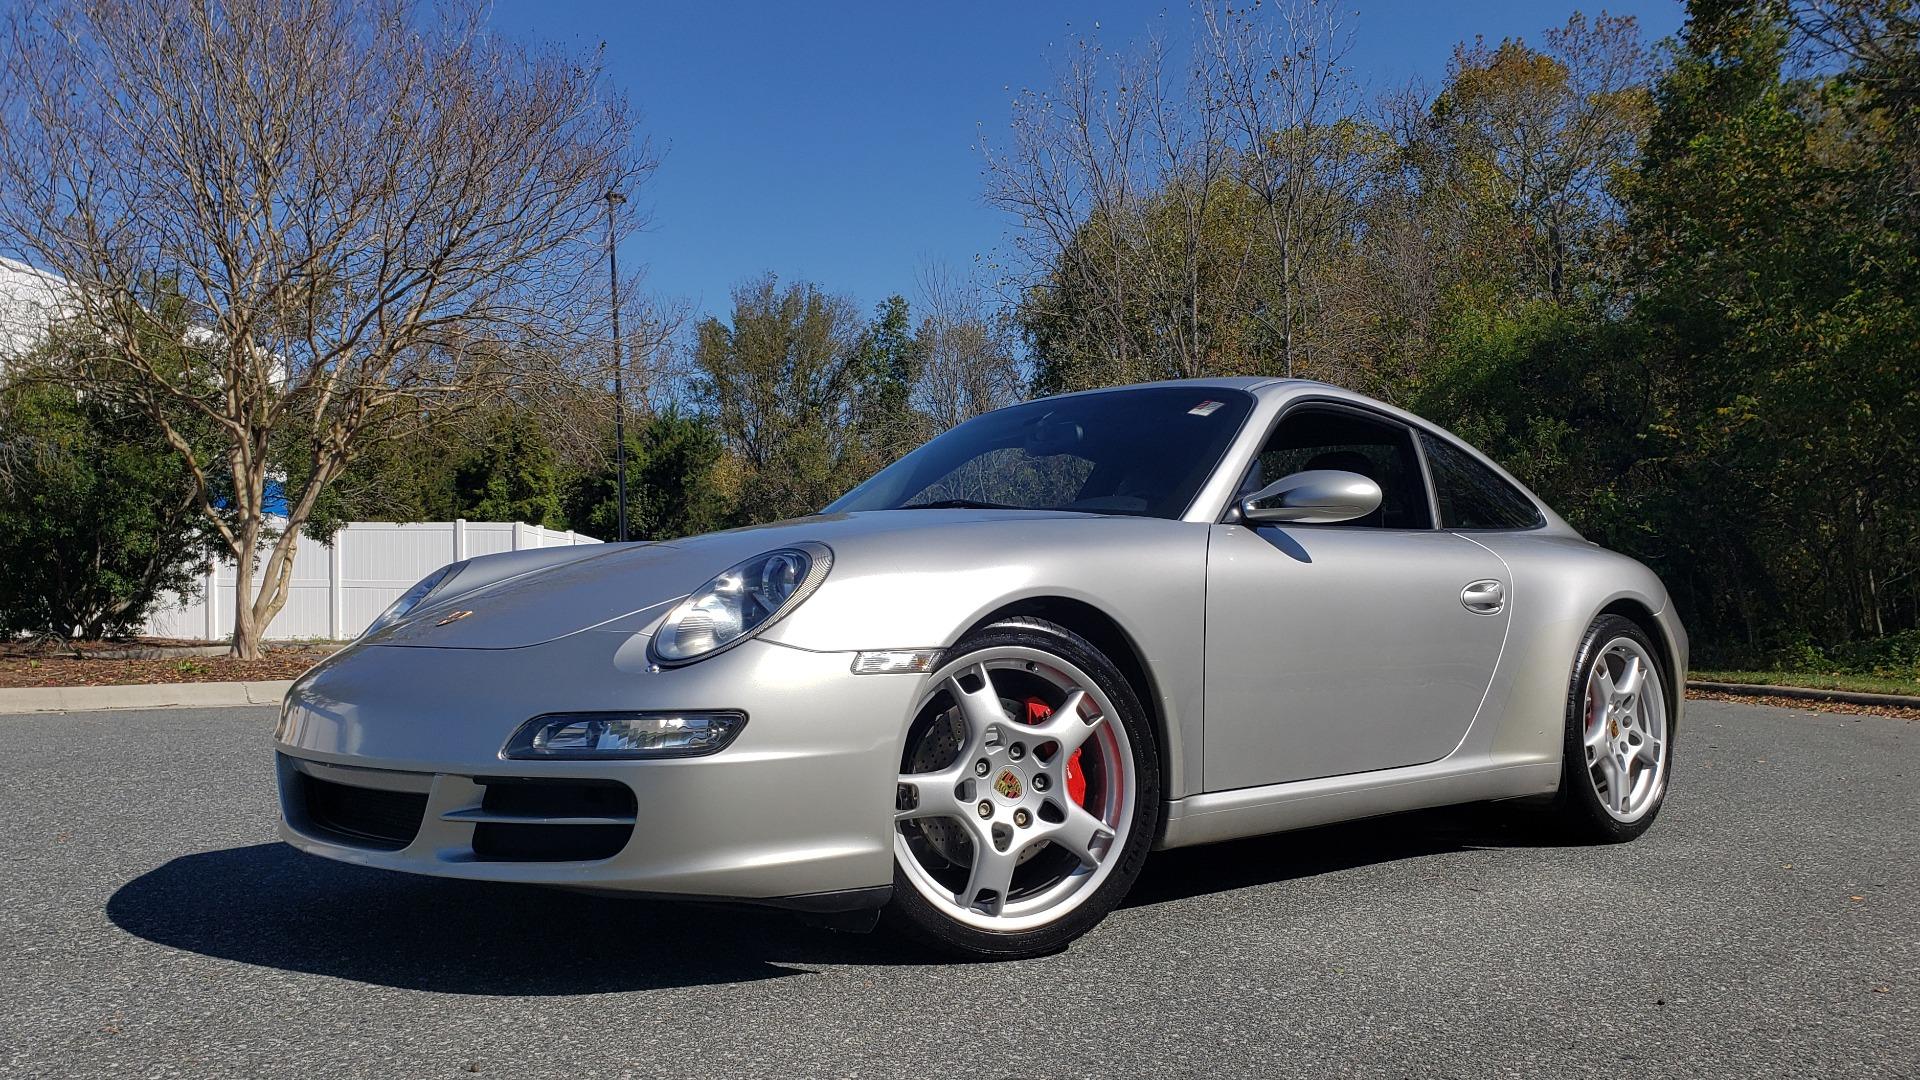 Used 2006 Porsche 911 CARRERA S / 5-SPD AUTO / SPORT CHRONO / NAV / BOSE / SUNROOF for sale Sold at Formula Imports in Charlotte NC 28227 1